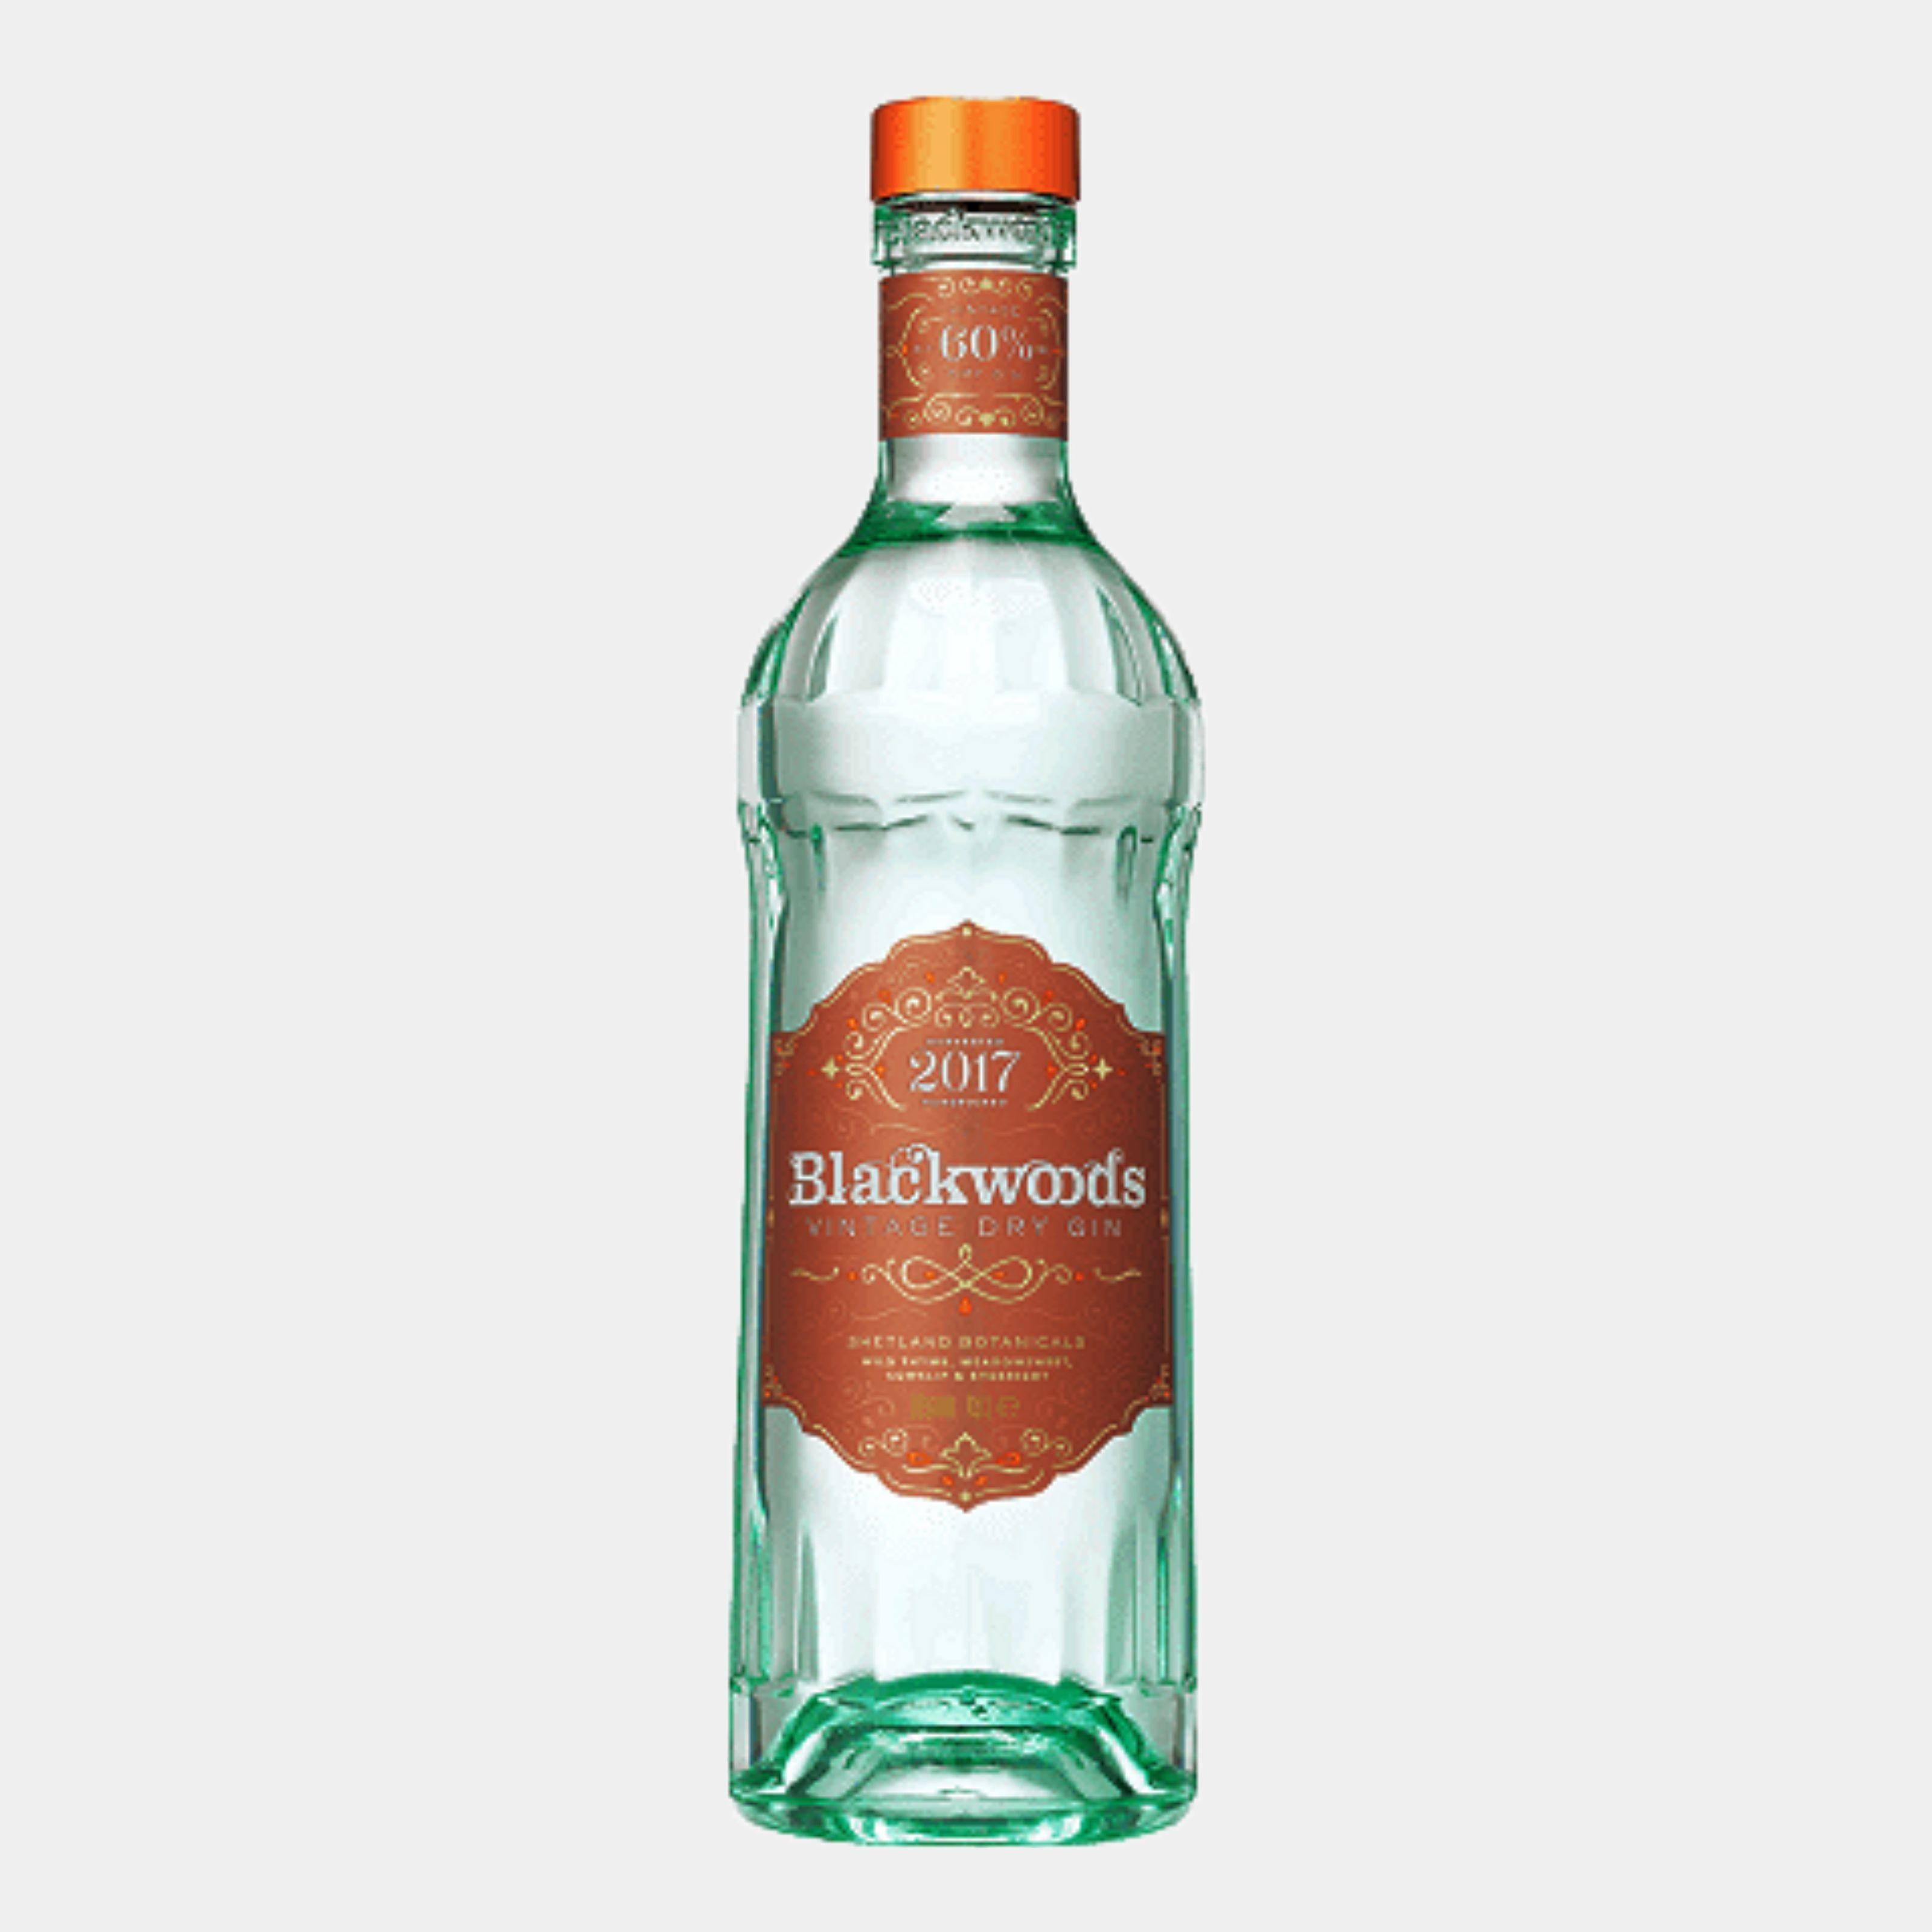 Blackwood's Vintage Dry Gin 60% 0.7L 60% Alk.